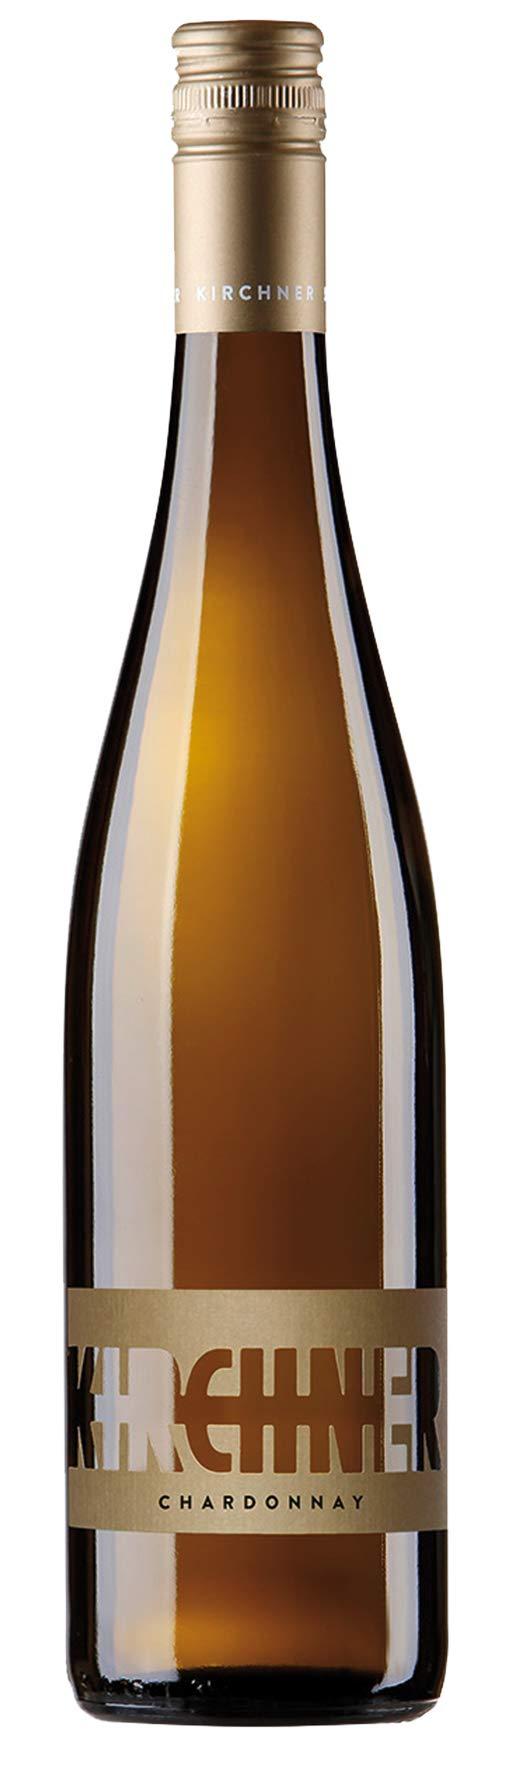 Kirchner-Chardonnay-Qualittswein-TrockenStadtmauer-2016-Weiss-6-x-075l